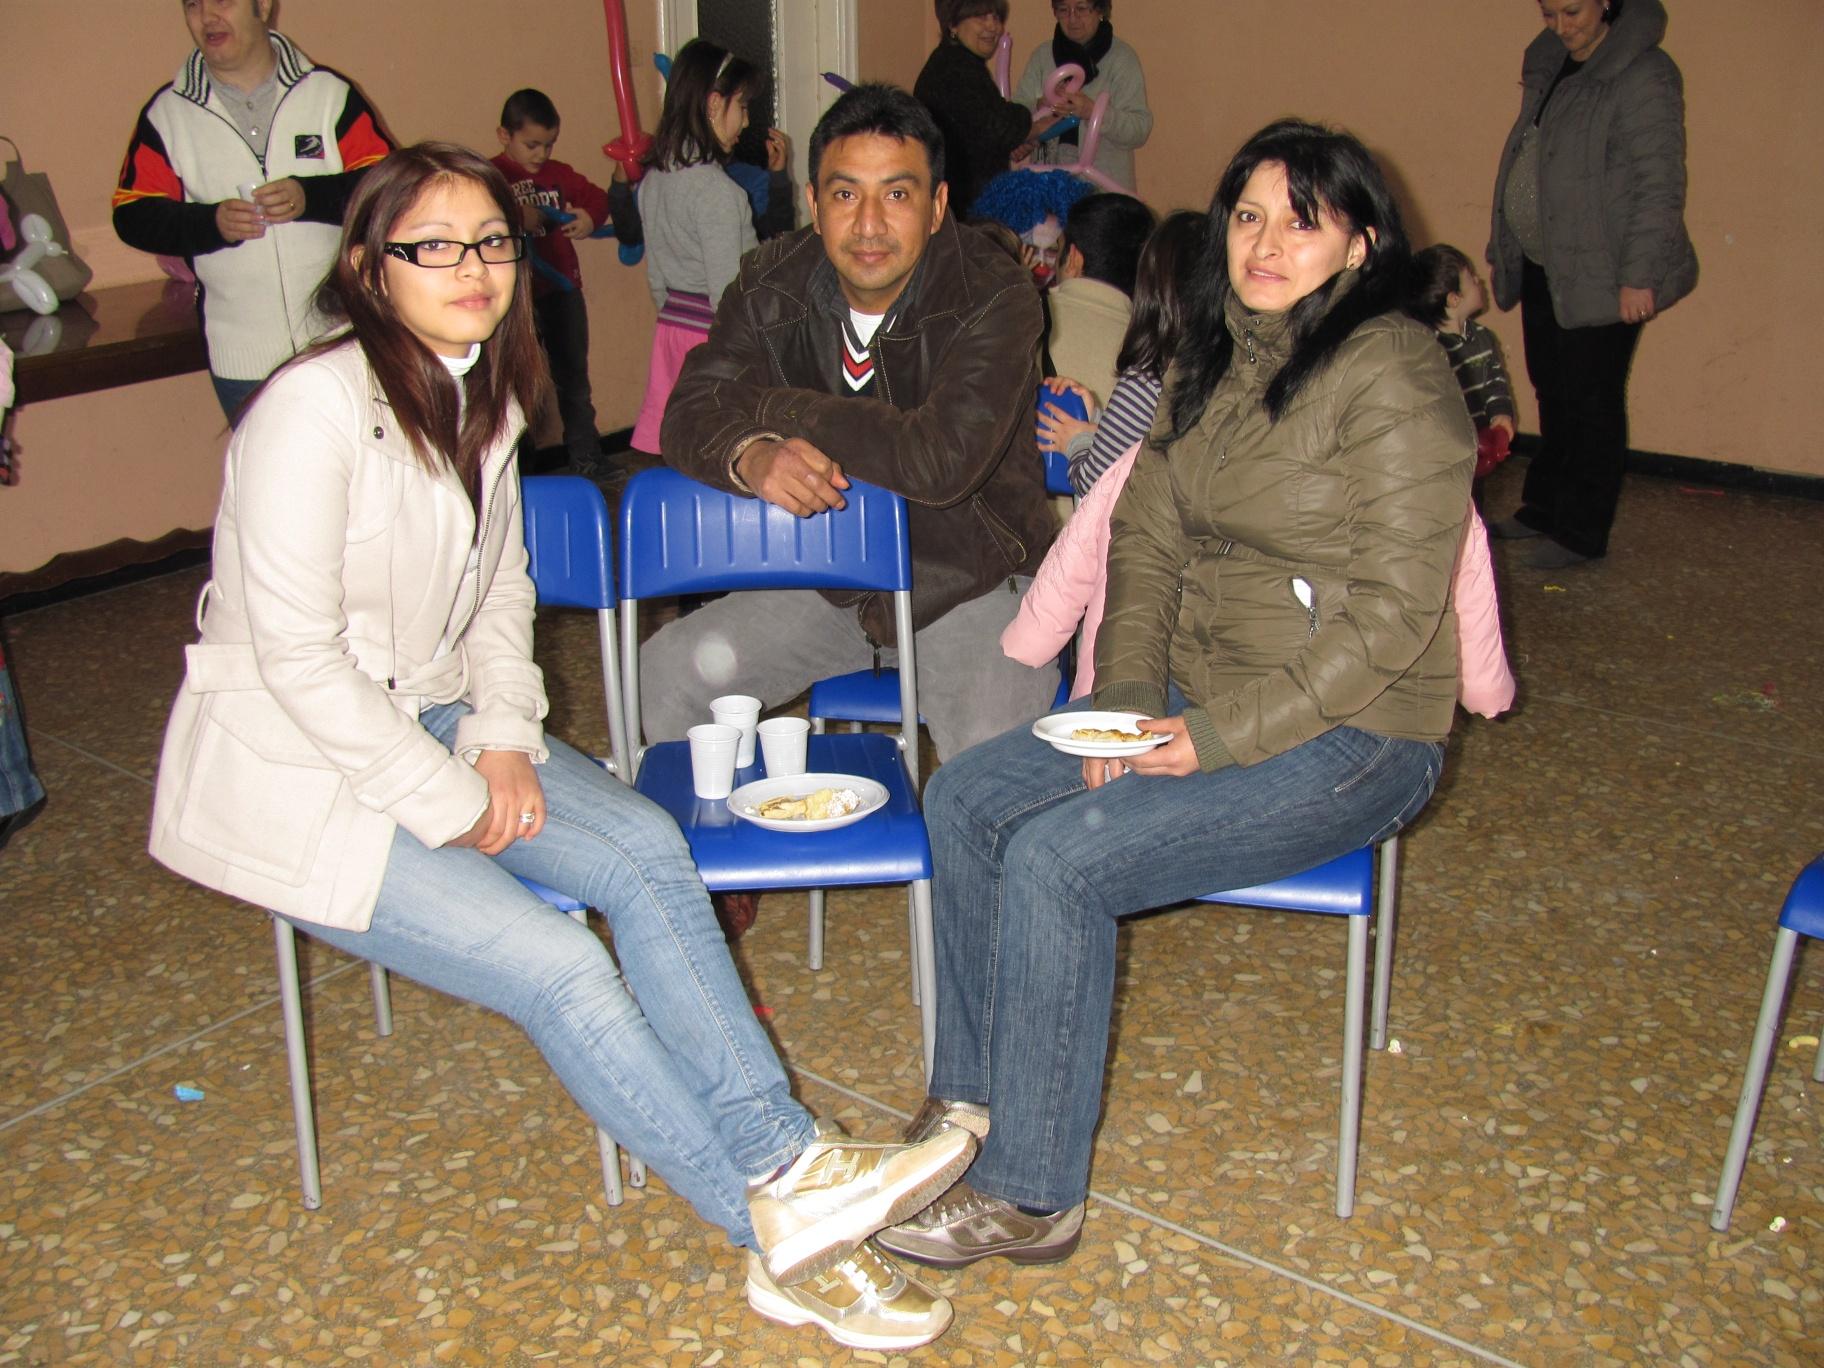 ricordo_battesimo_gesu_2011-01-23-16-51-38